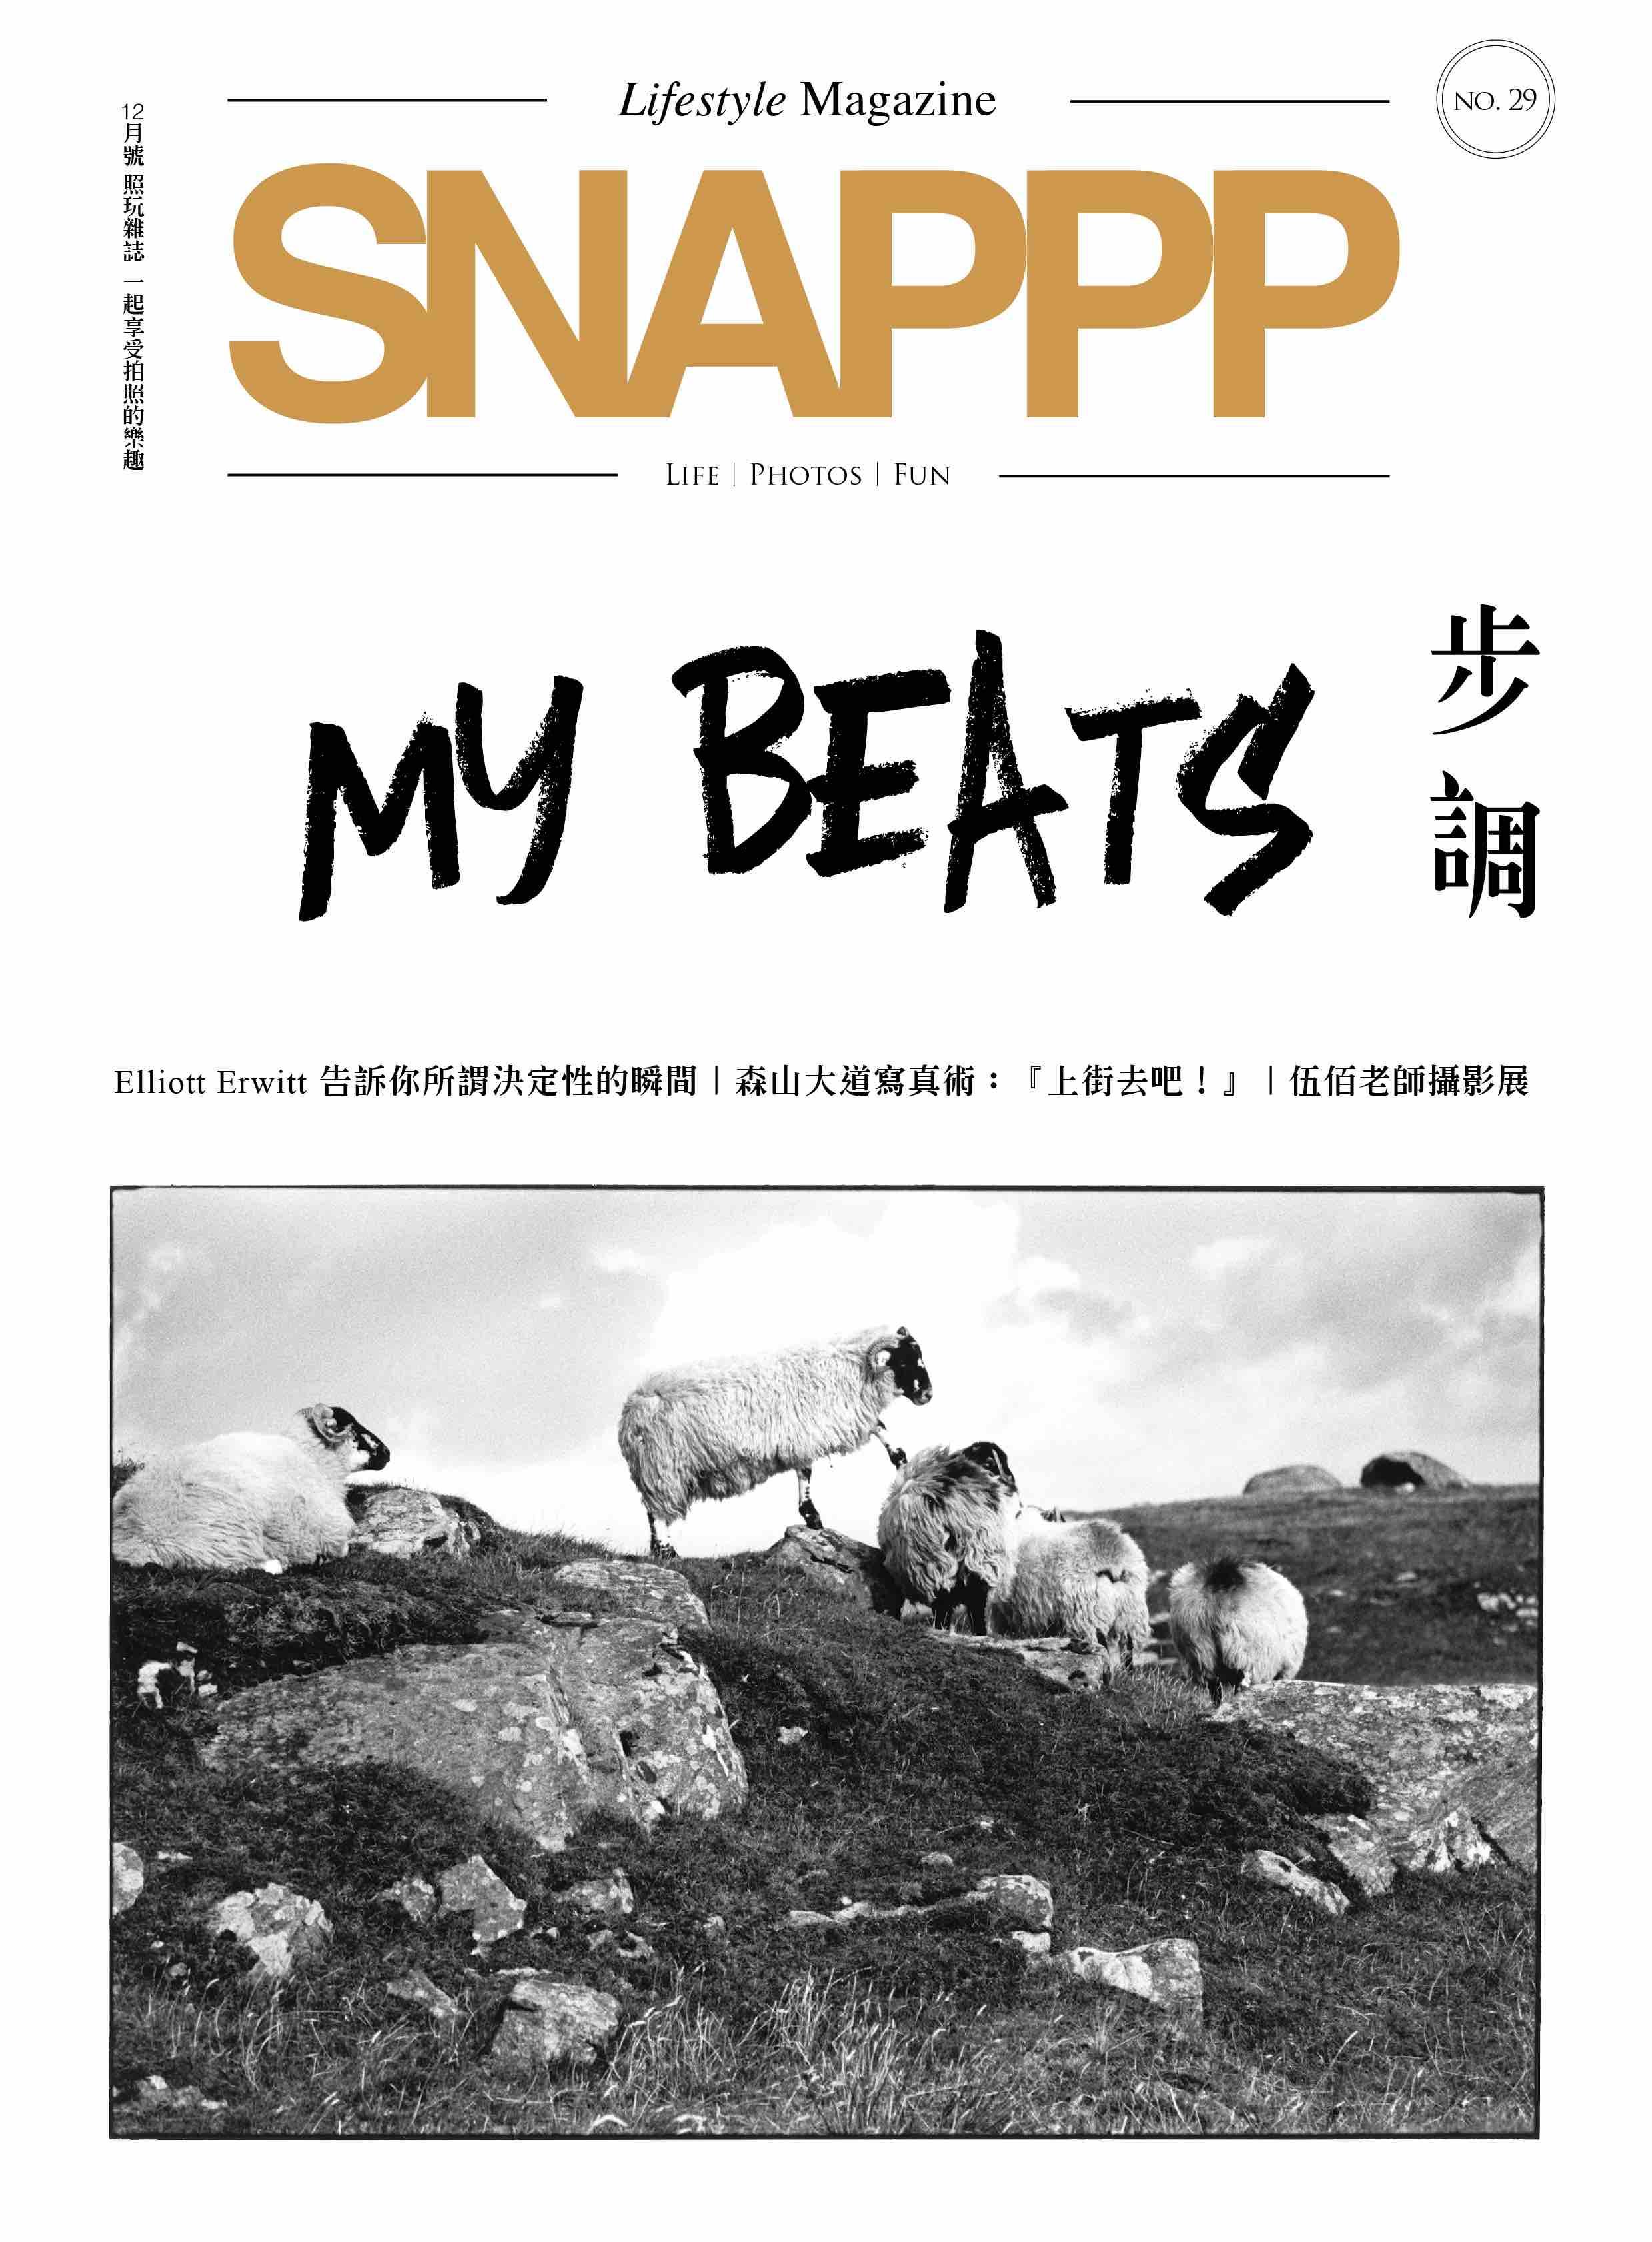 SNAPPP-NO29 COVER-ver2.jpg